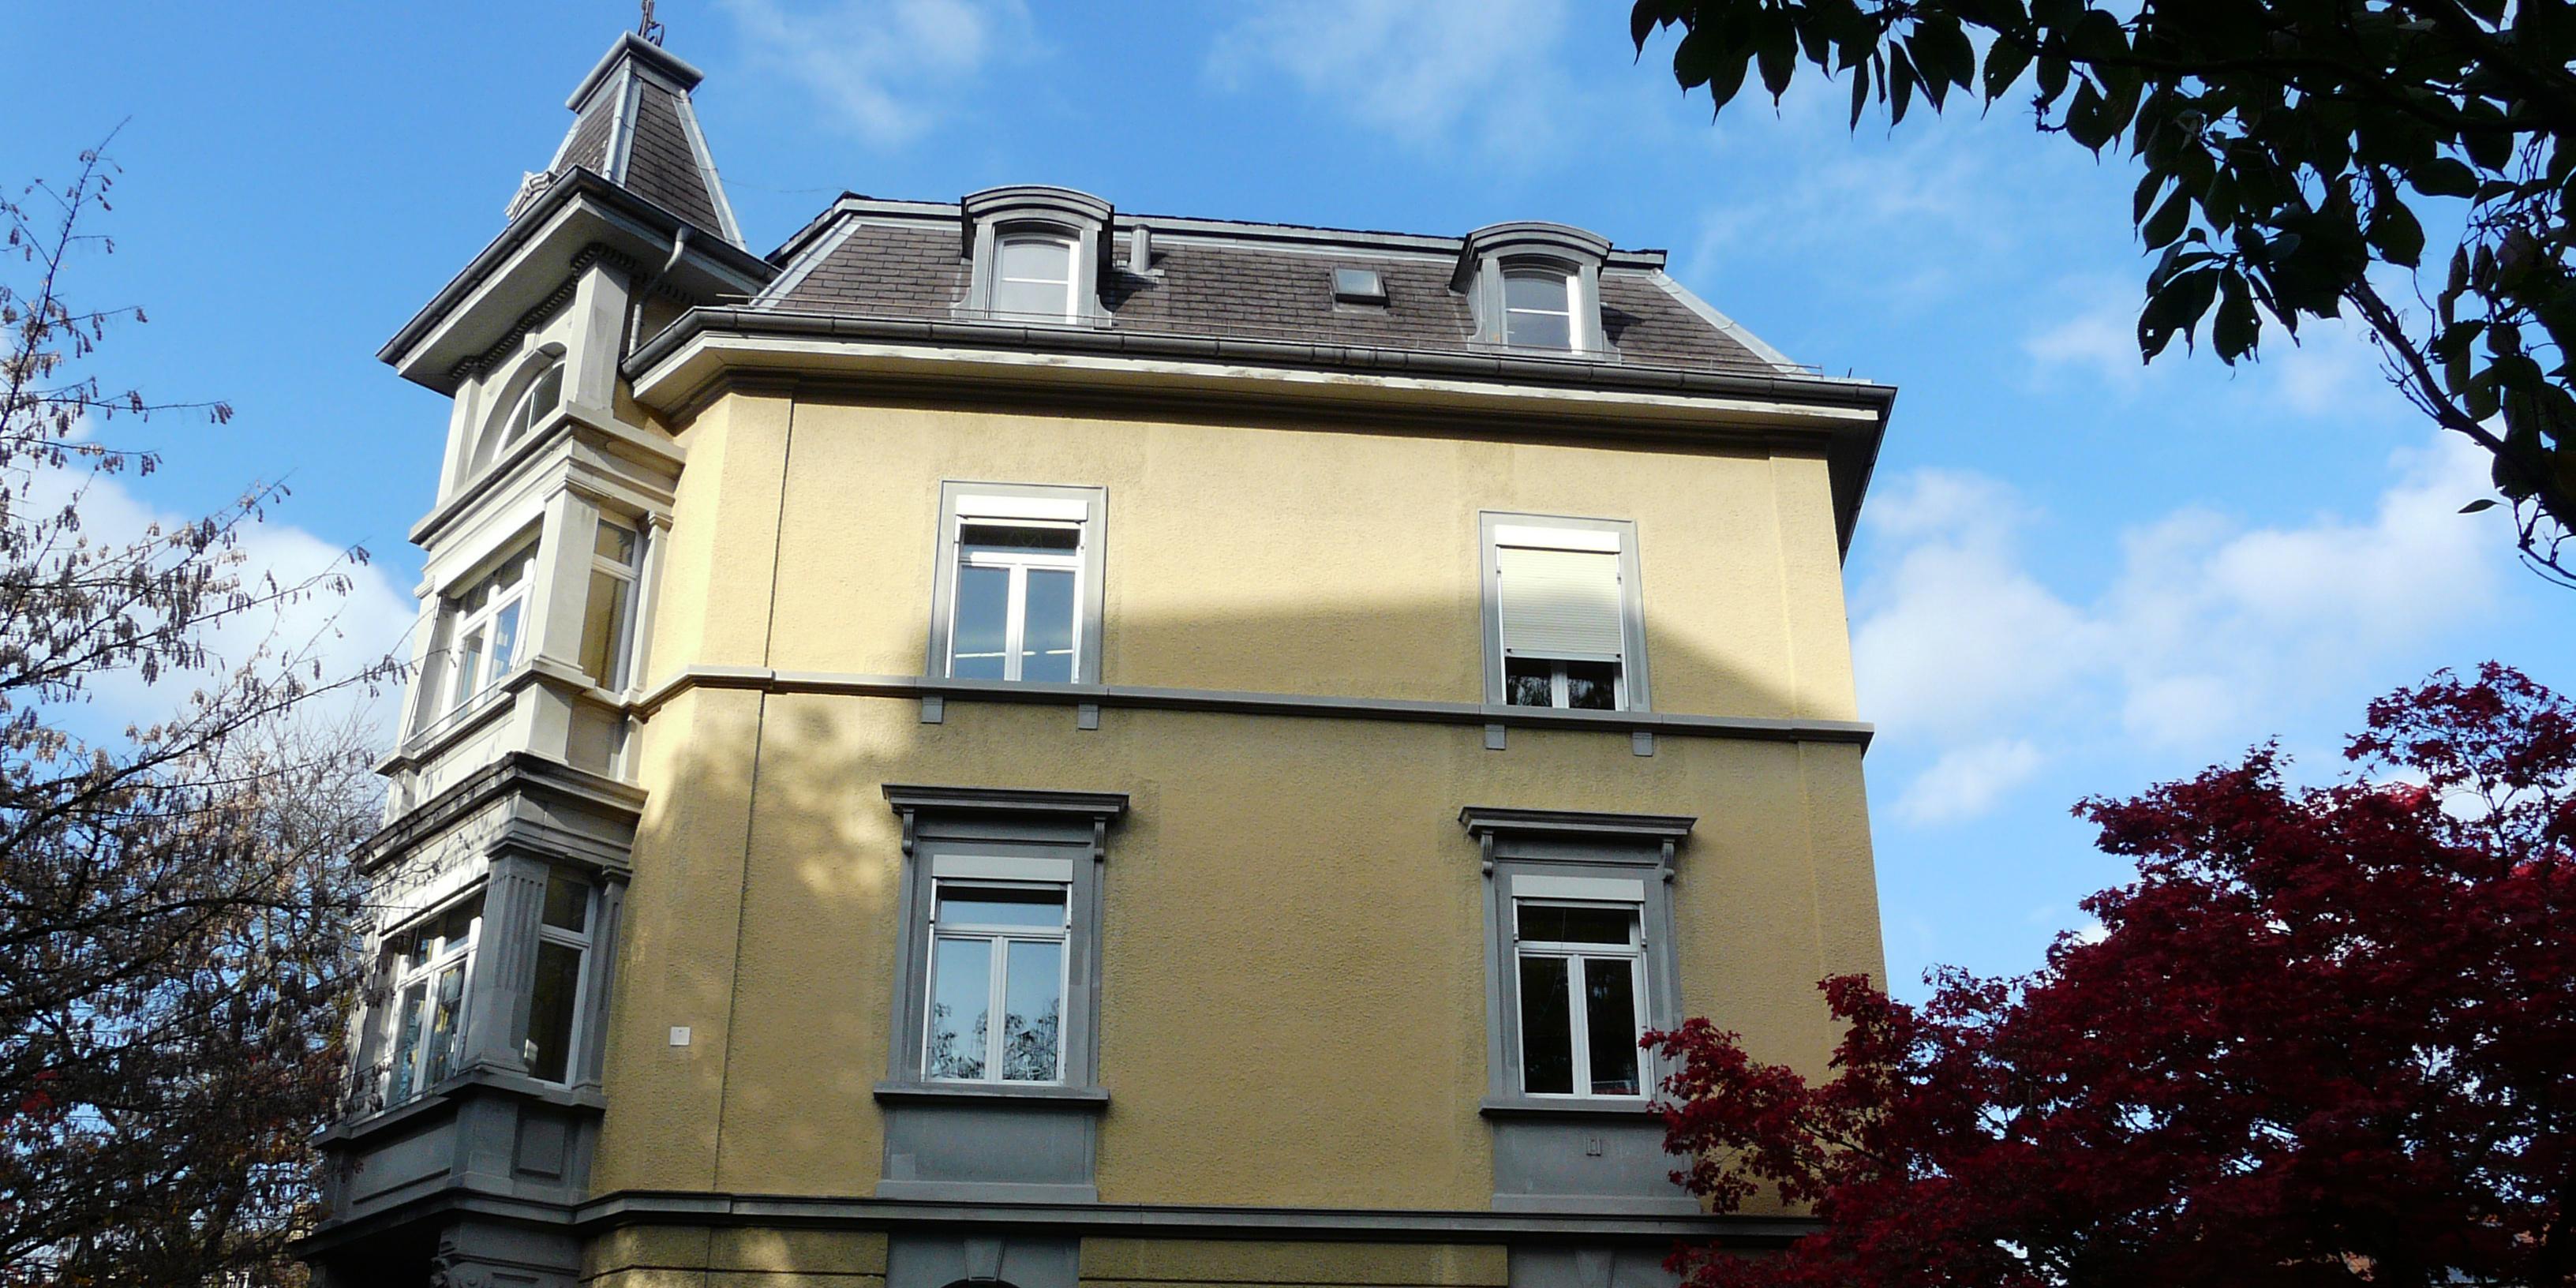 Integrale Tagesschule Winterthur